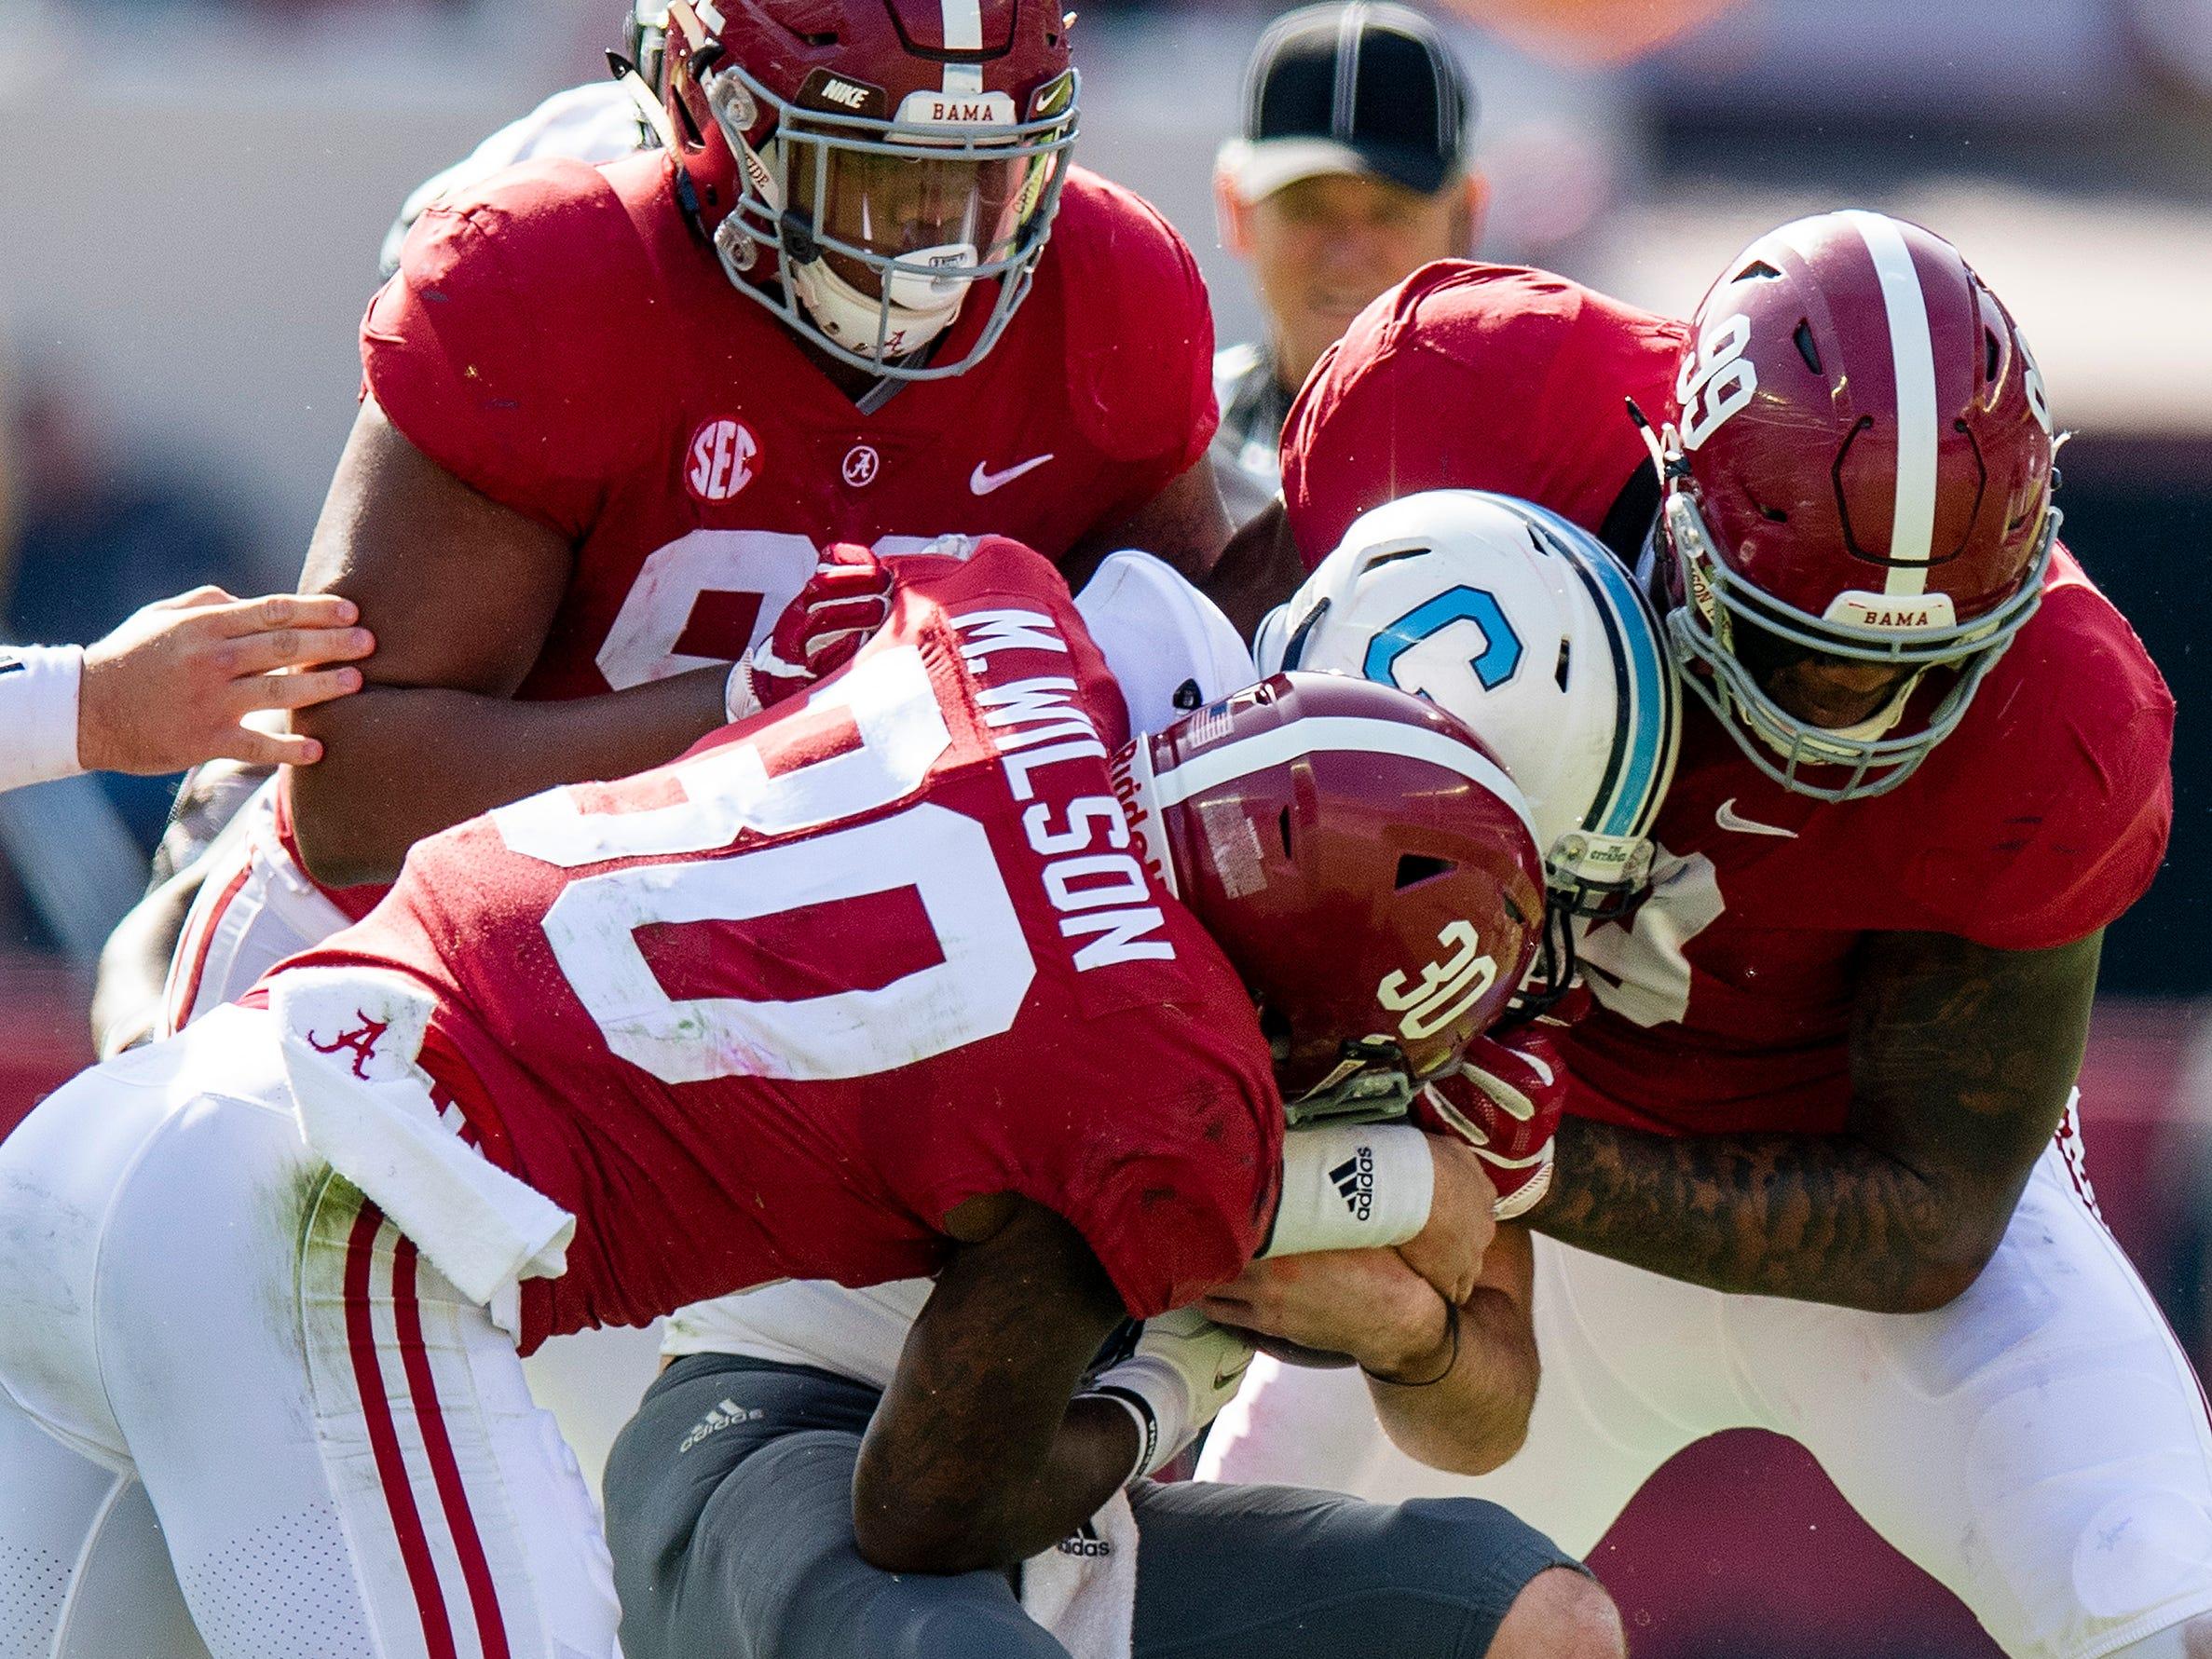 Alabama linebacker Mack Wilson (30) and defensive lineman Raekwon Davis (99) and defensive lineman Quinnen Williams (92) sack Citadel quarterback Brandon Rainey (16) In first half action at Bryant-Denny Stadium in Tuscaloosa, Ala., on Saturday November 17, 2018.